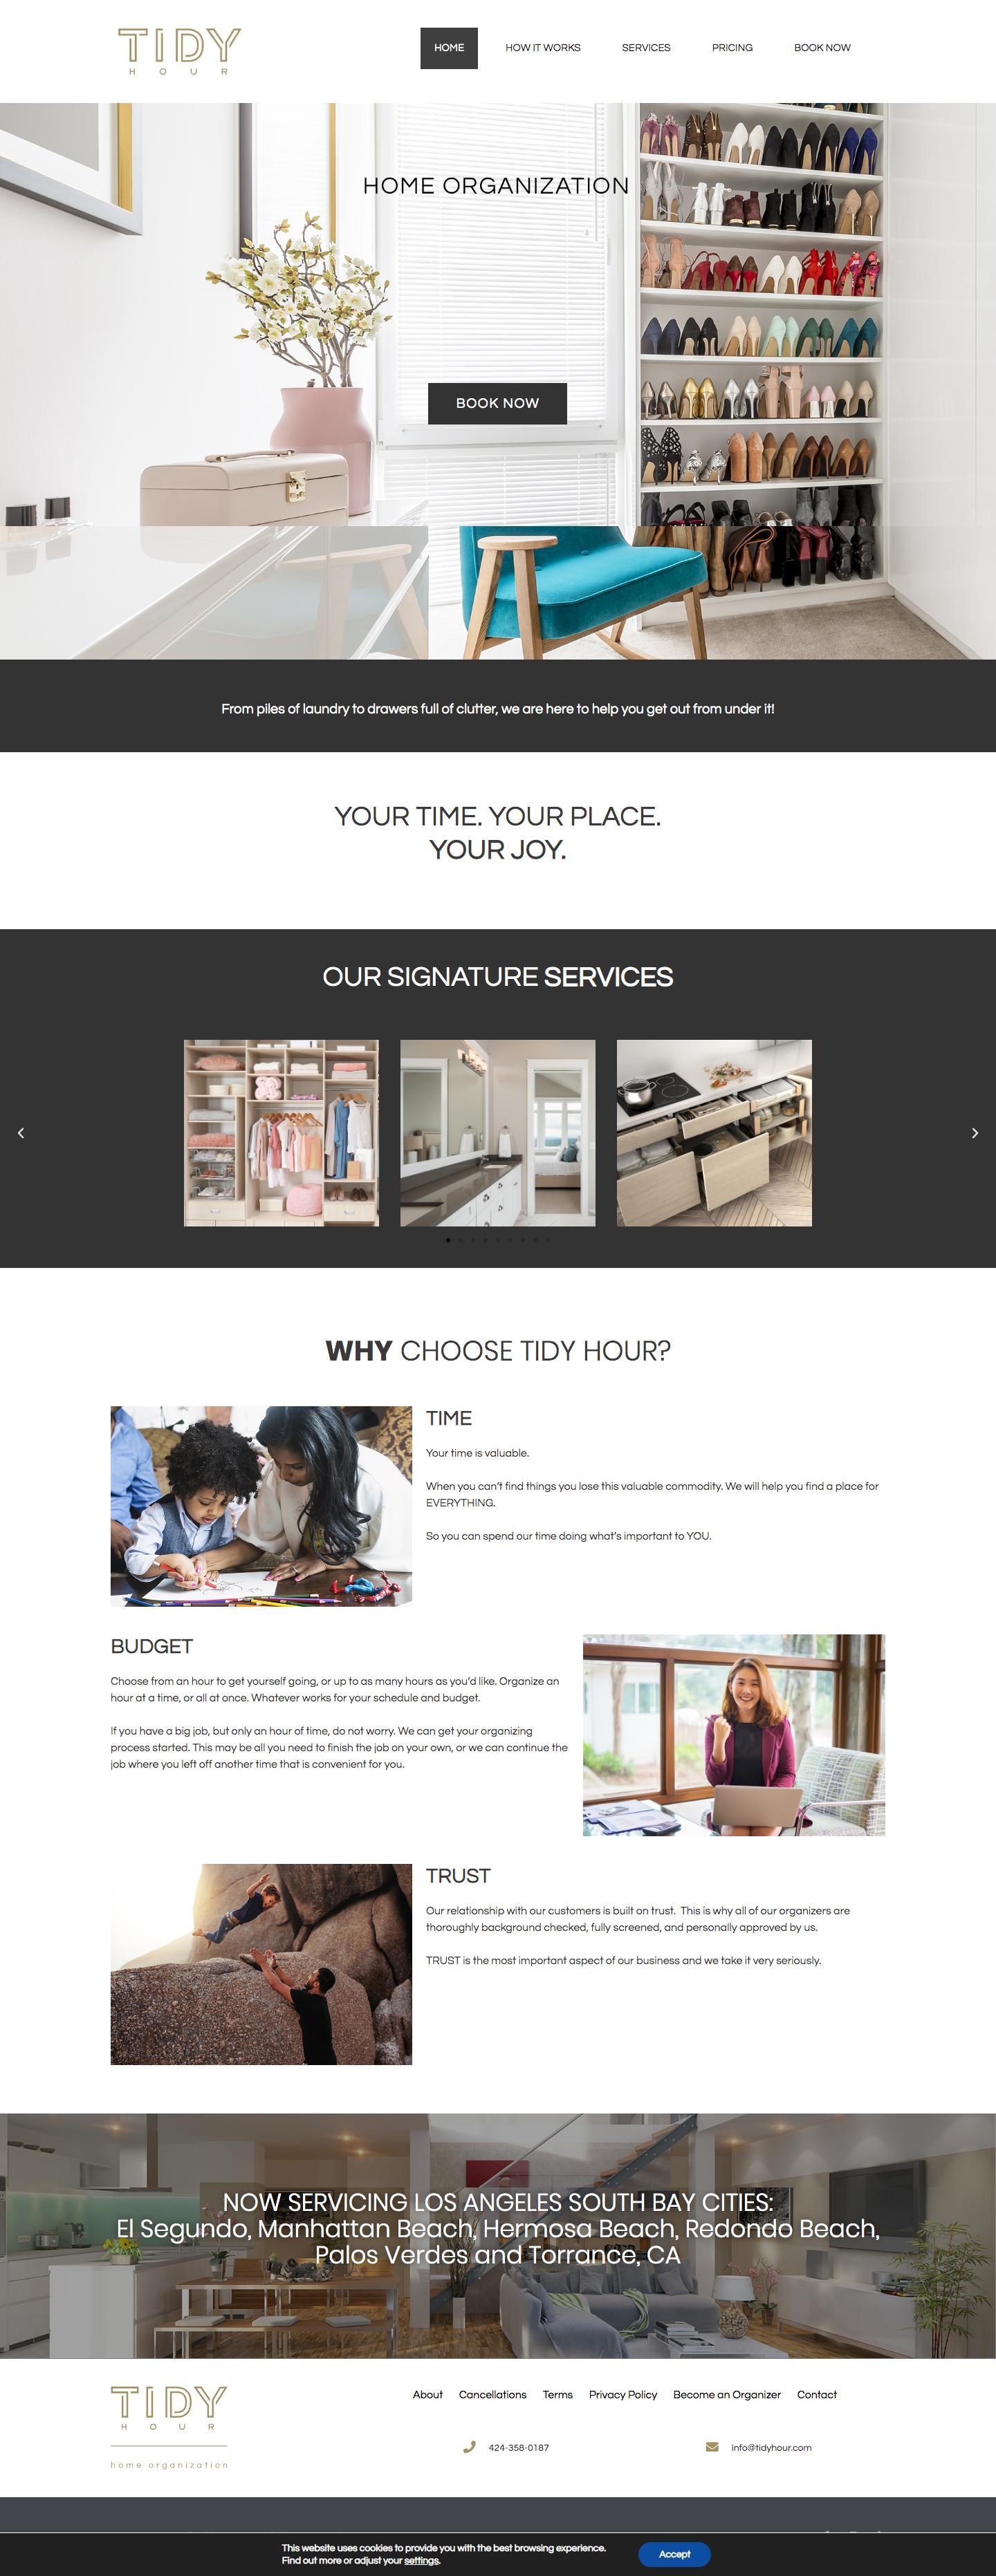 Tidy Hour website design